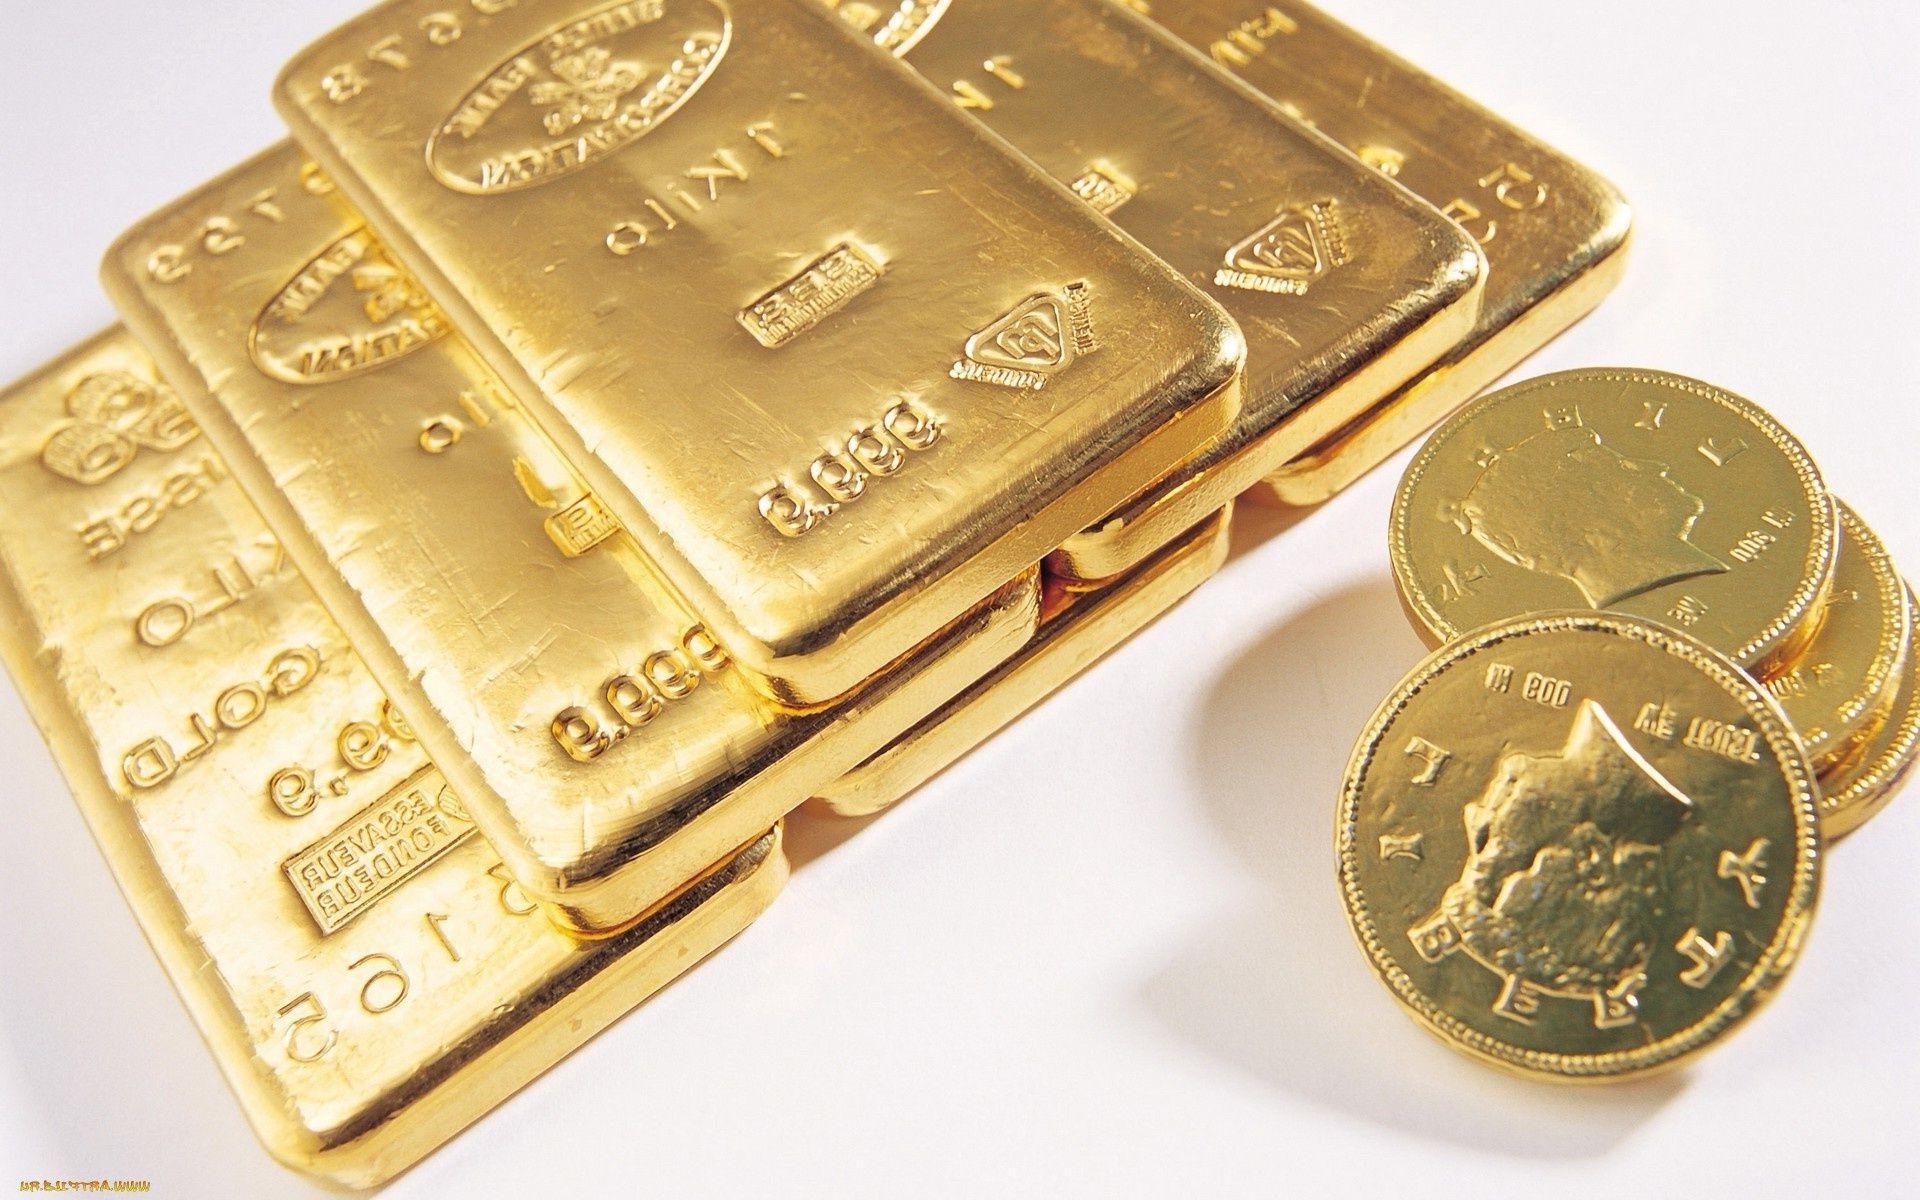 Деньги золото монеты - скачать обои на ...: million-wallpapers.ru/wallpaper/dengi-zoloto-monety/id/25738